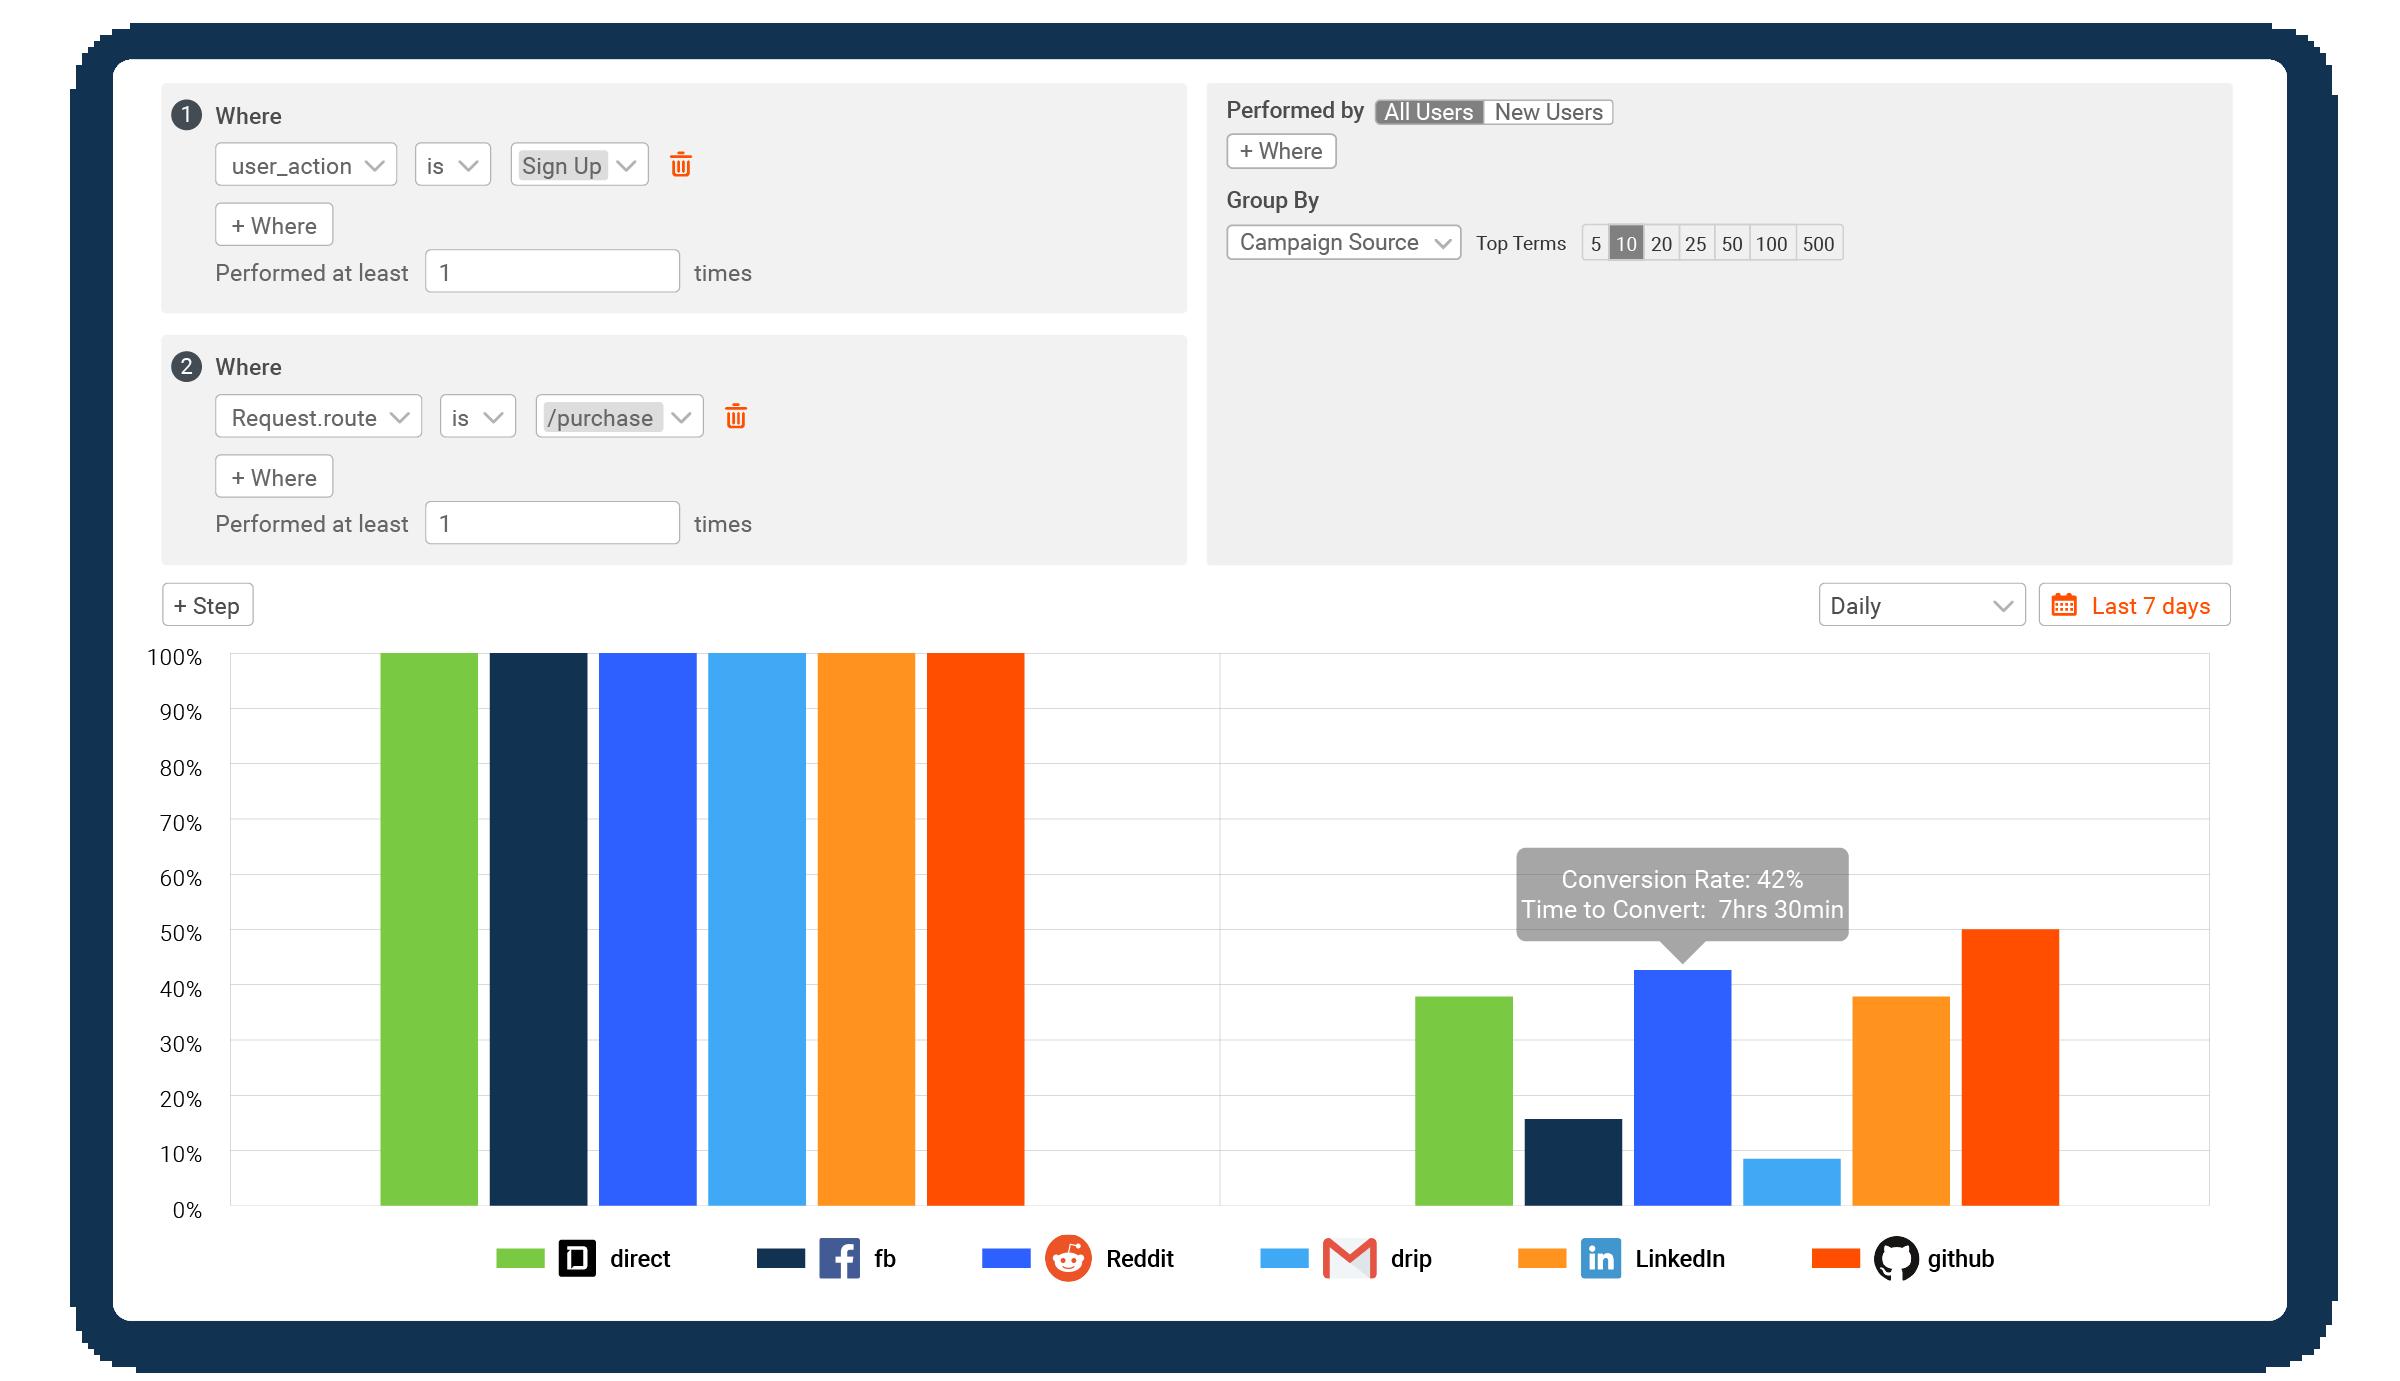 Developer activation funnel broken down by acquisition channel